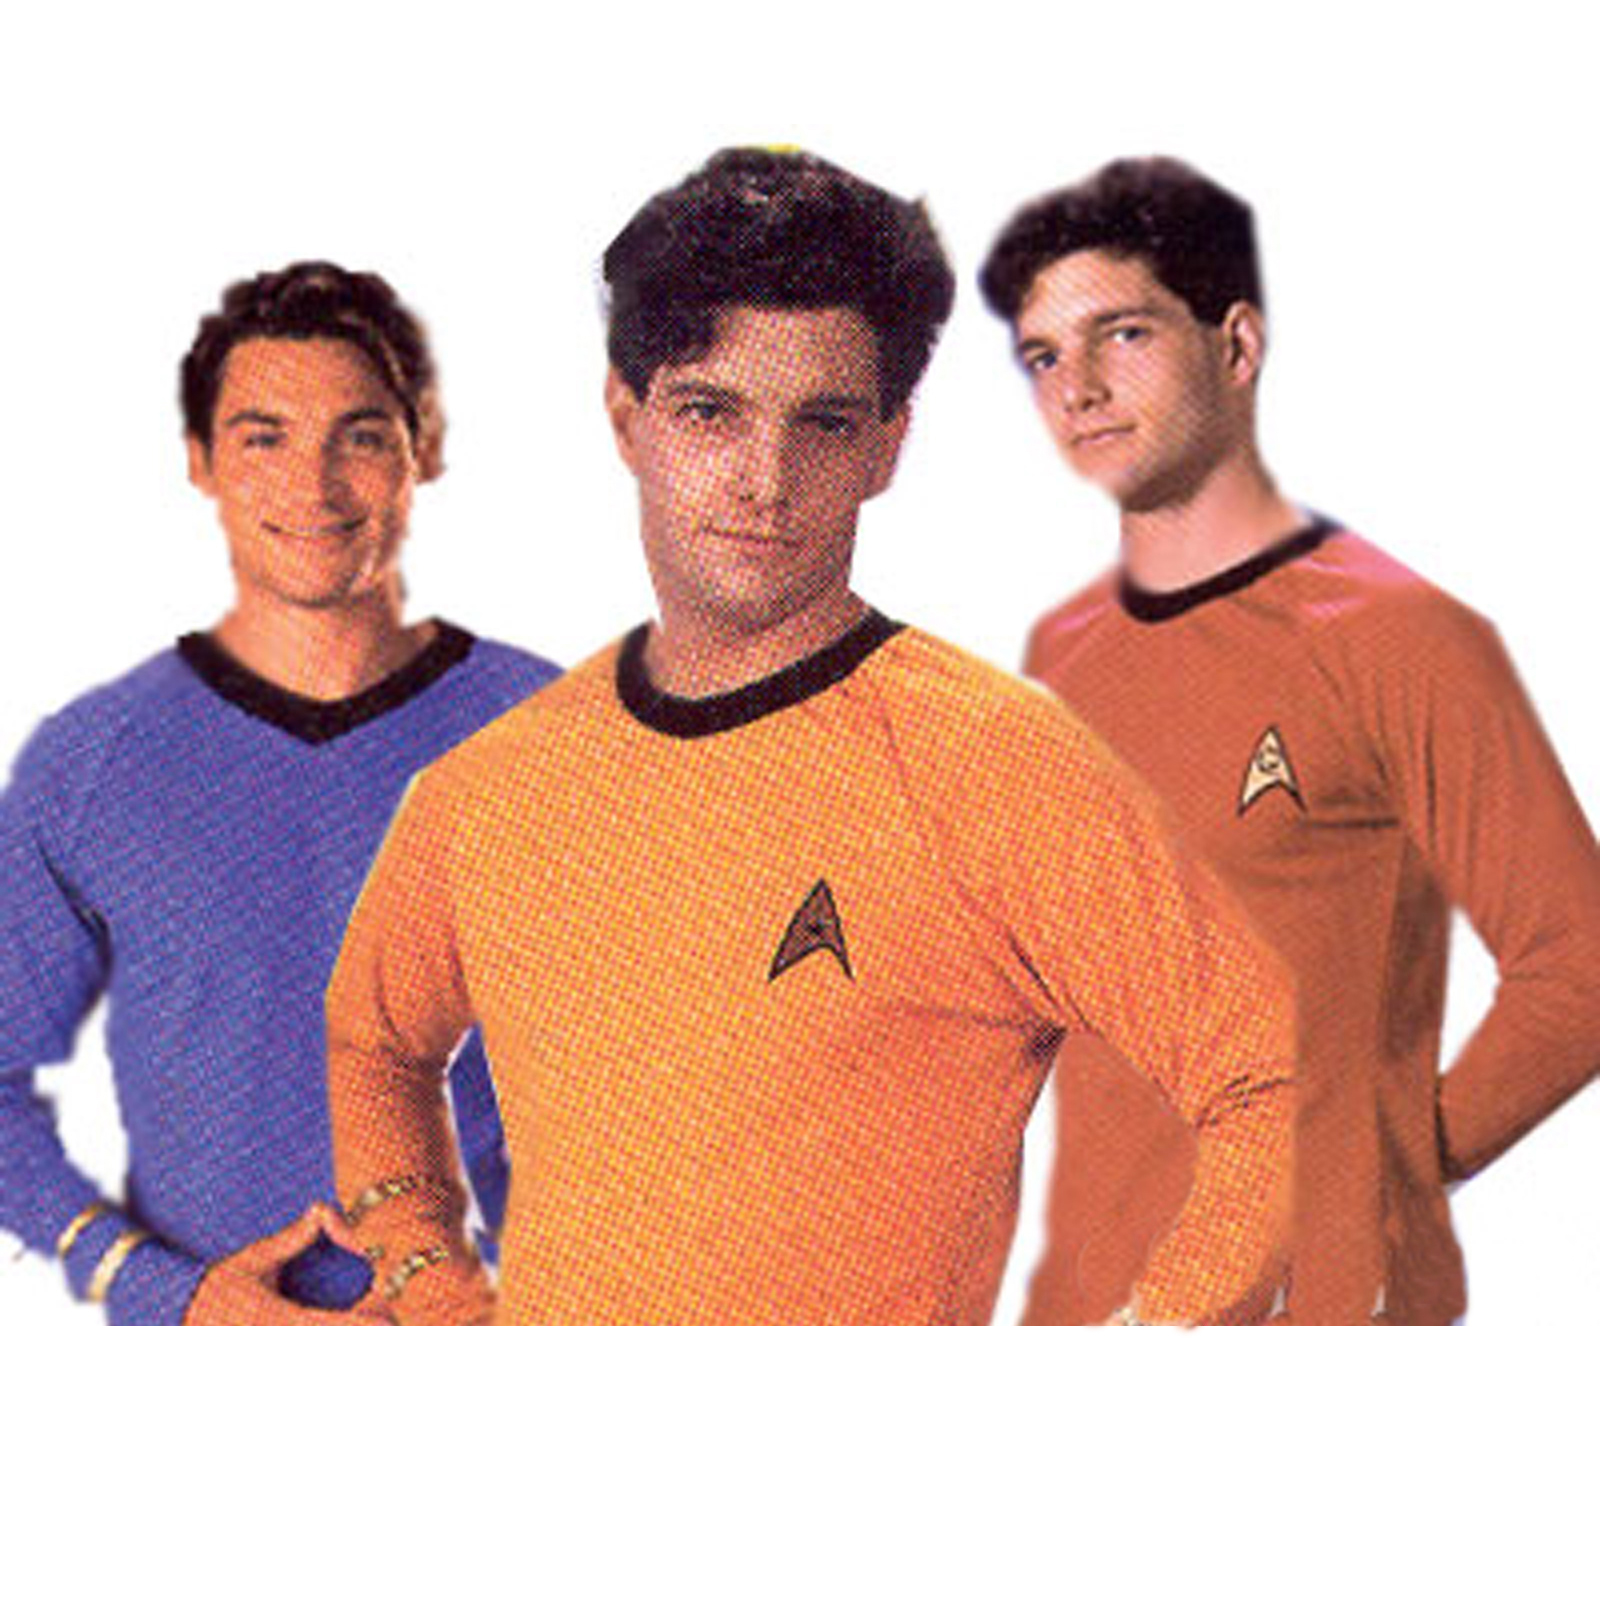 Star Trek Original Shirt - Sci Fi halloween costumes for adults